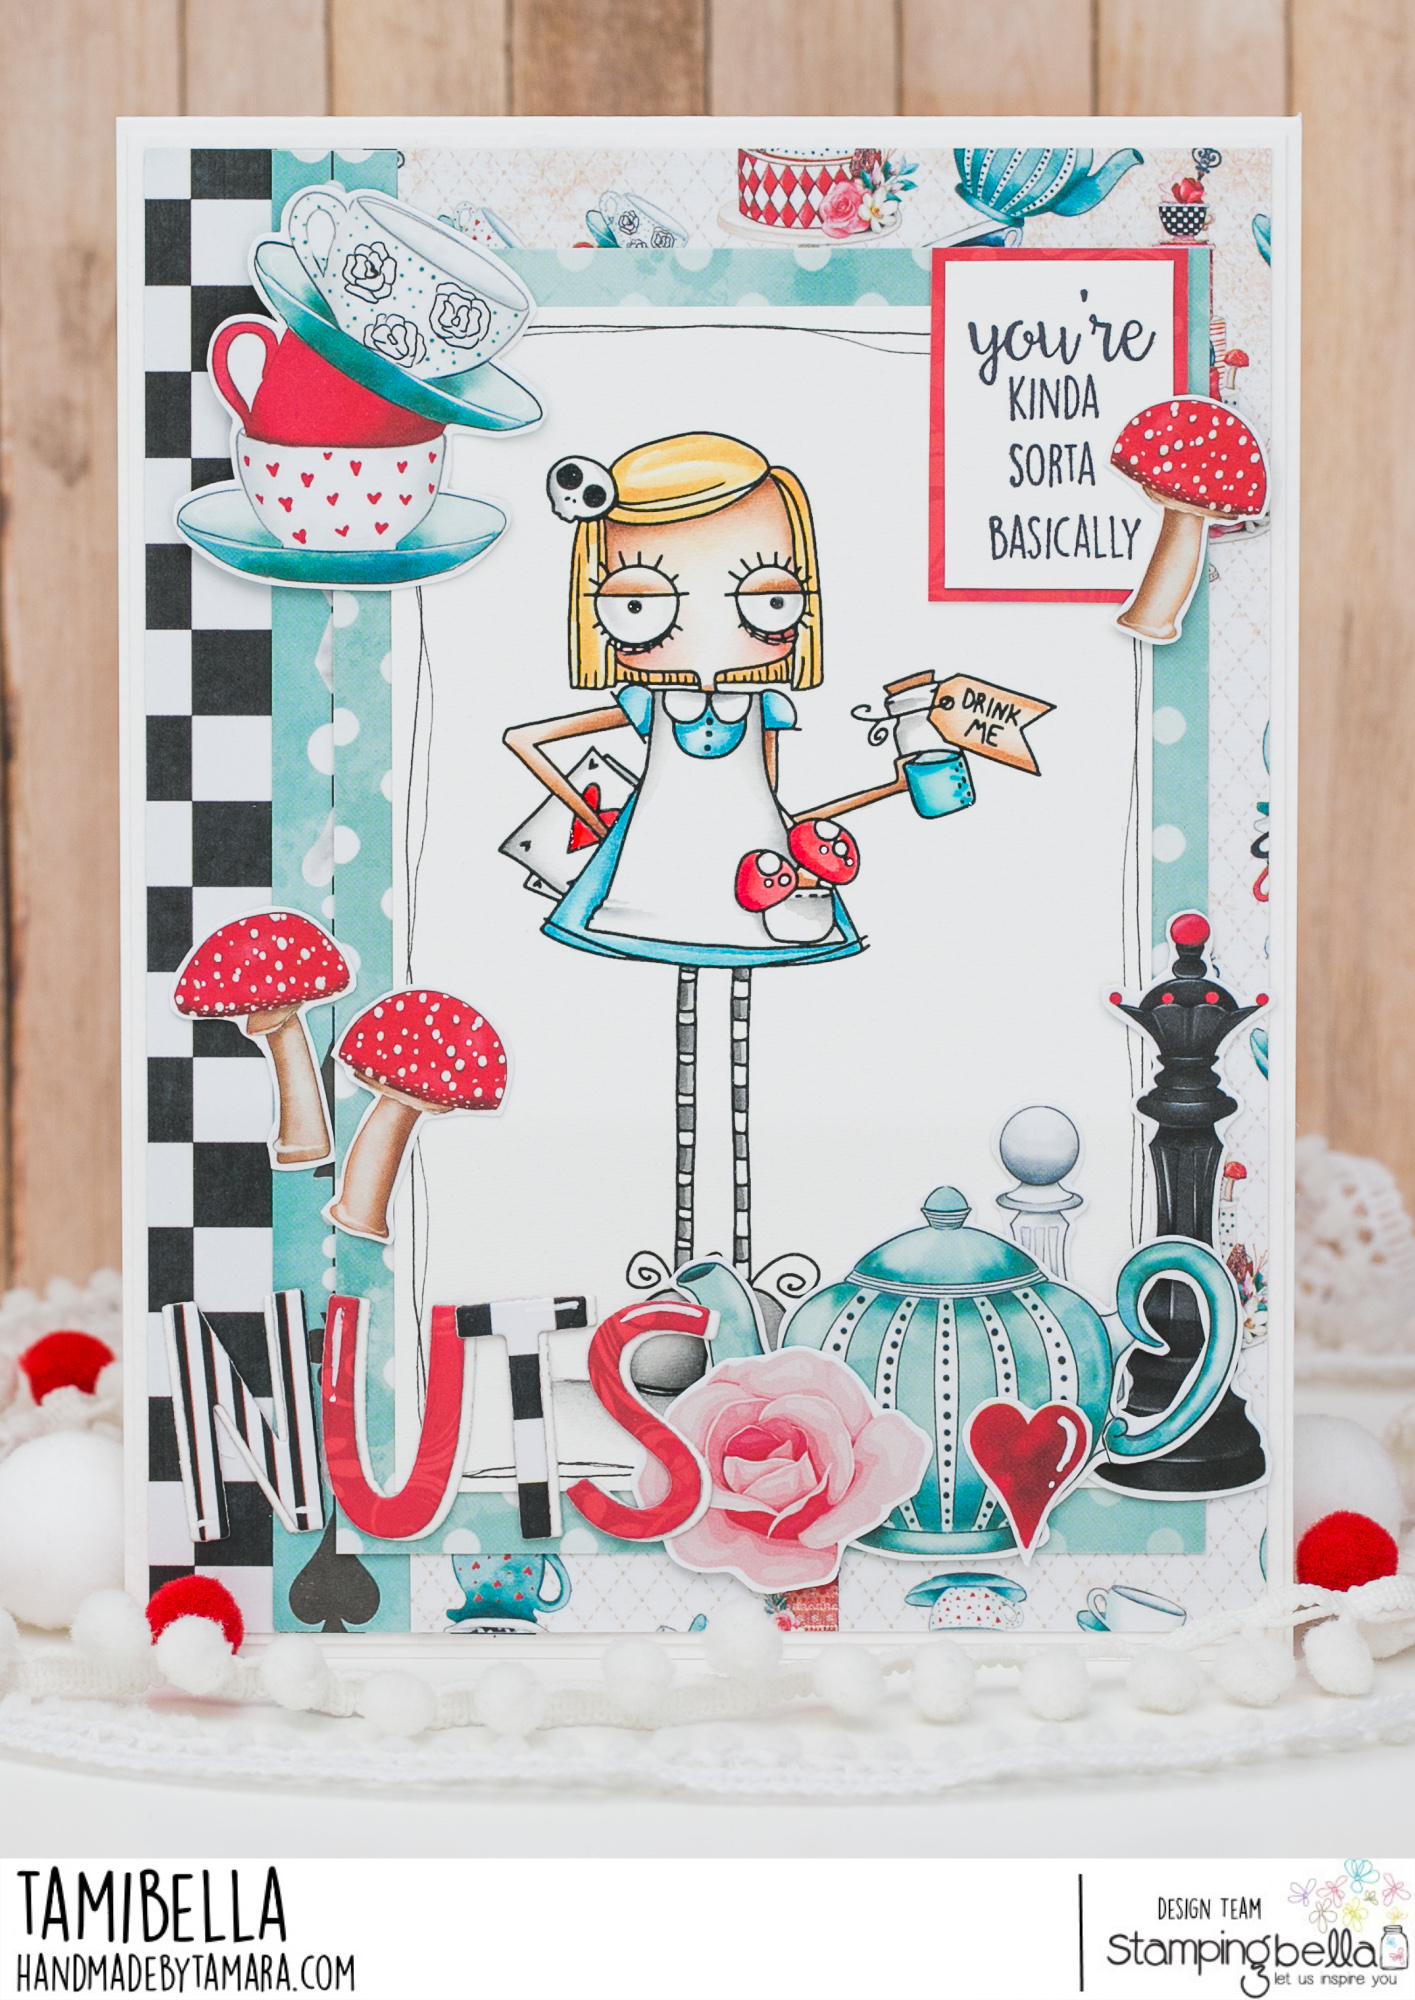 www.stampingbella.com: rubber stamp used: ODDBALL ALICE IN WONDERLAND card by Tamara Potocnik